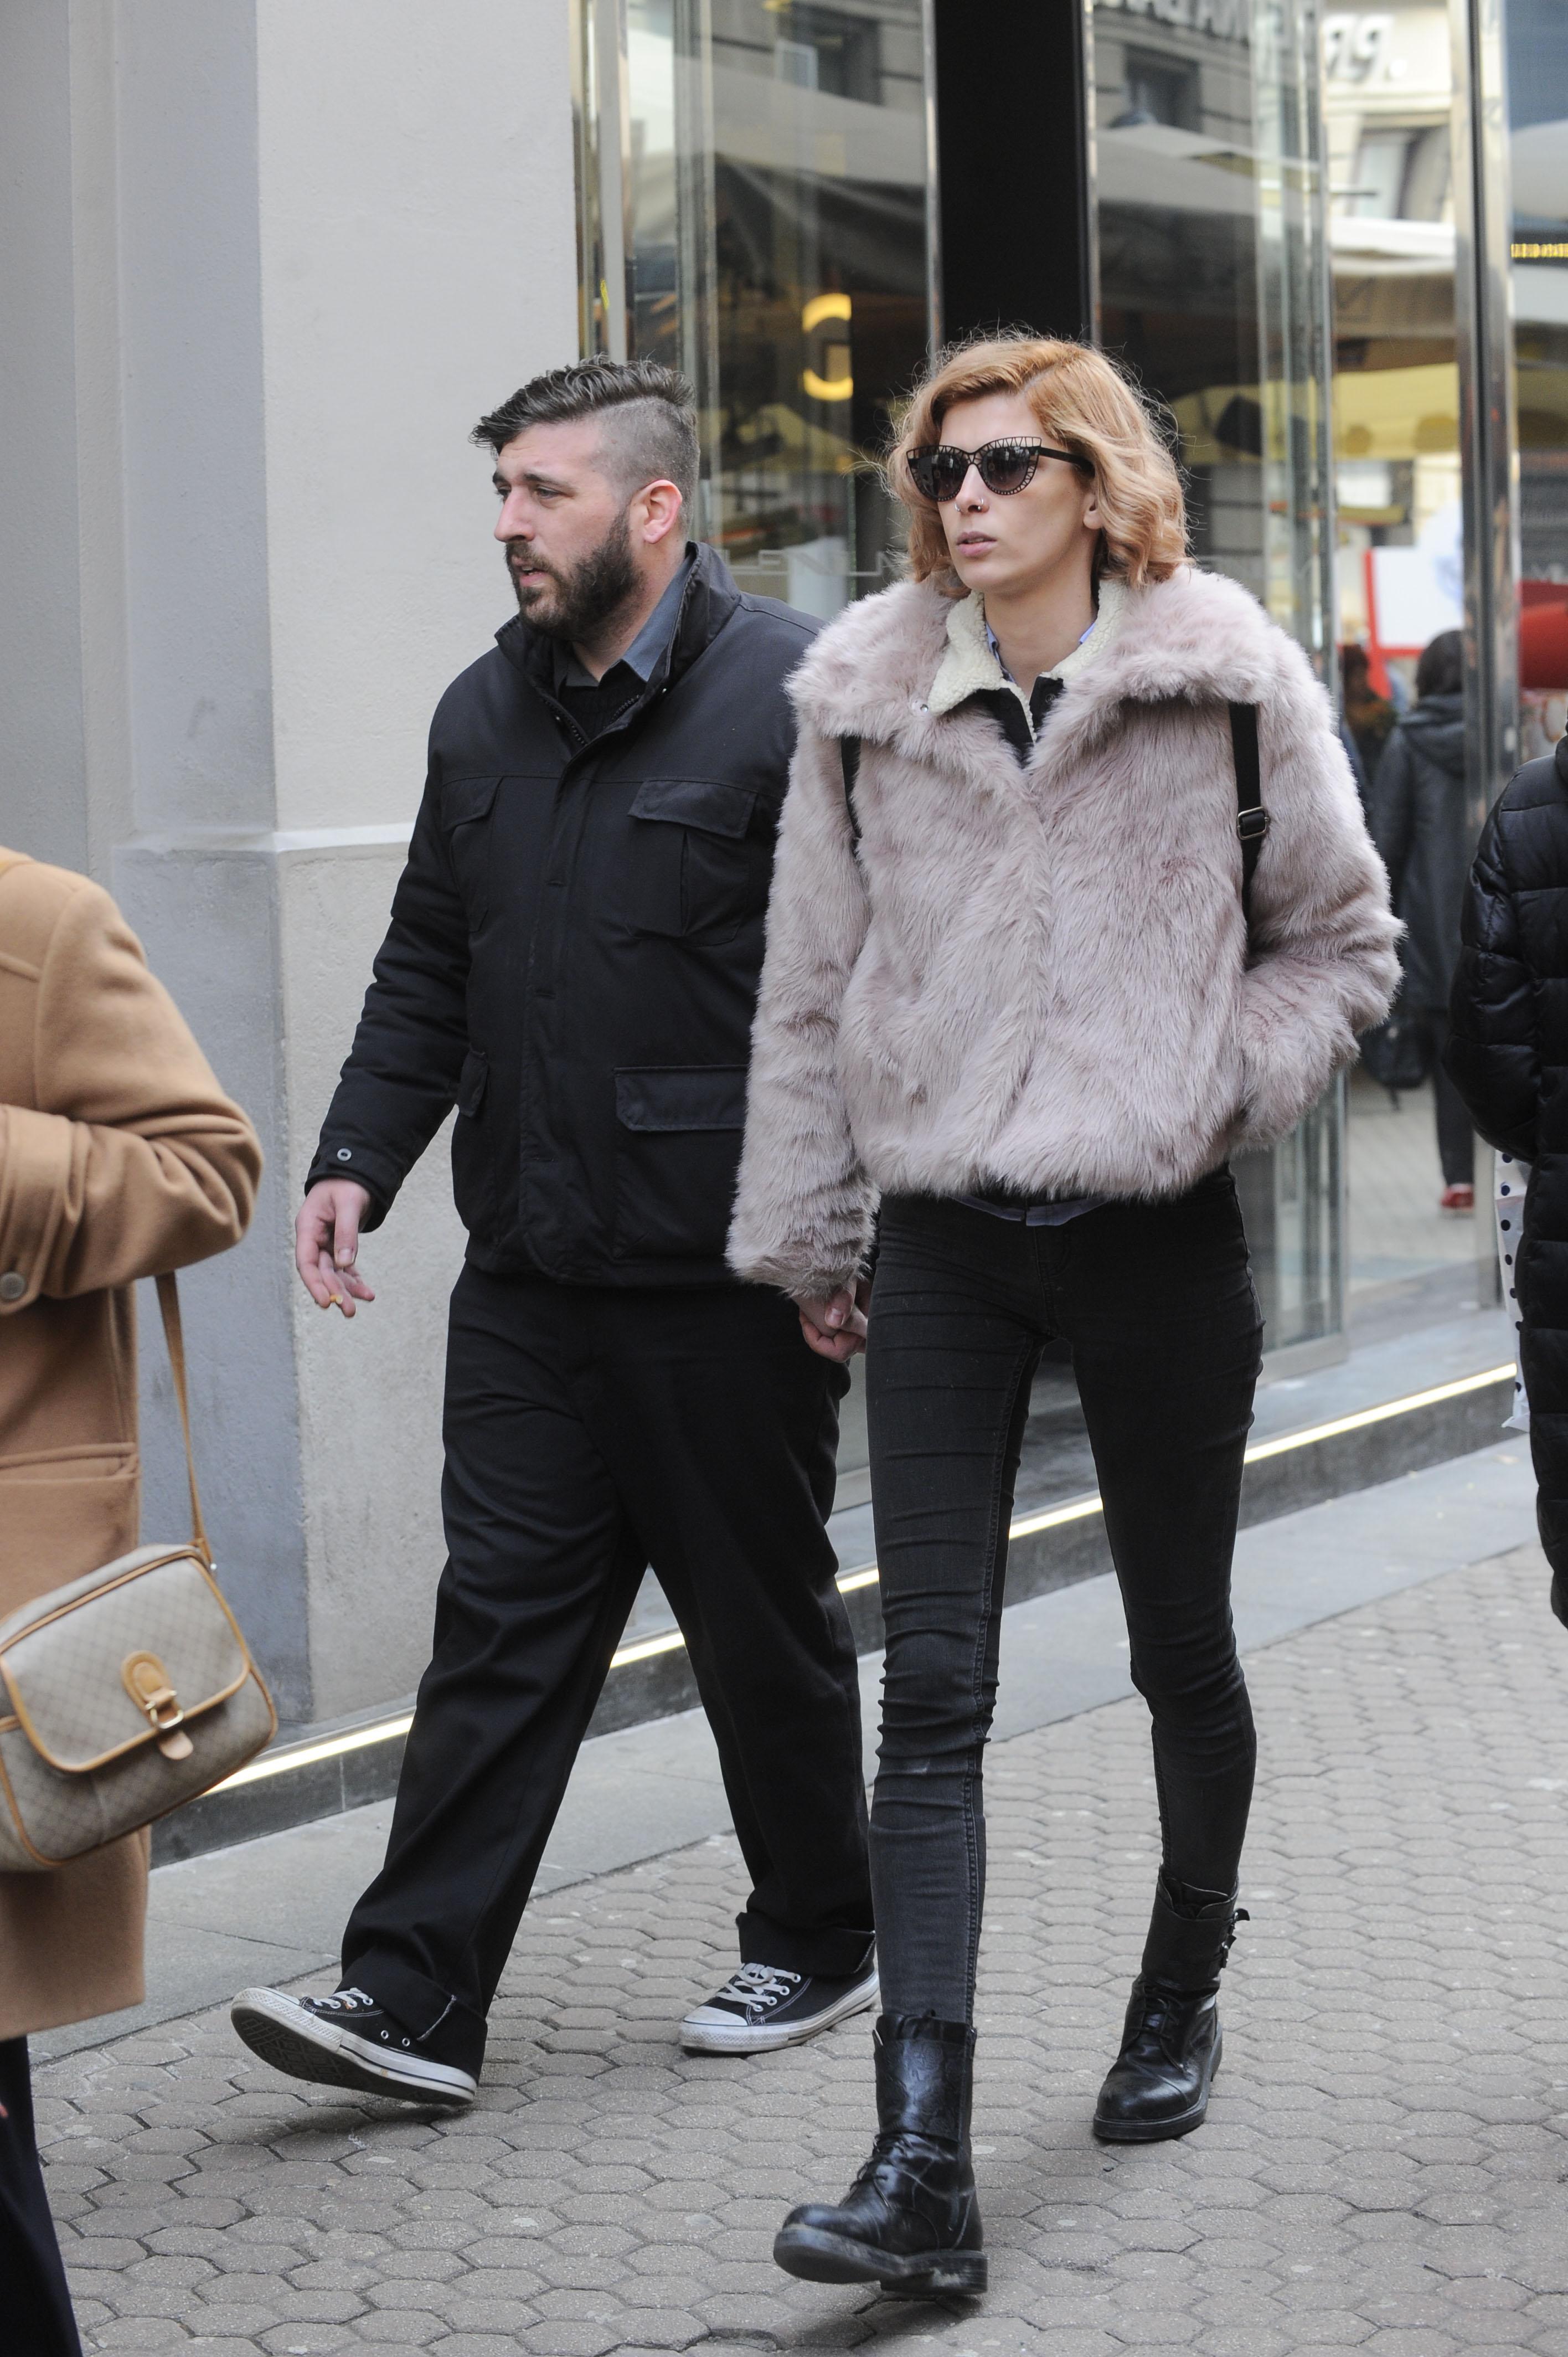 Spica / Zagreb 17.02.2018. / foto: Maja Jurovic / Kristina Salinovic i decko Enrico Migliorati